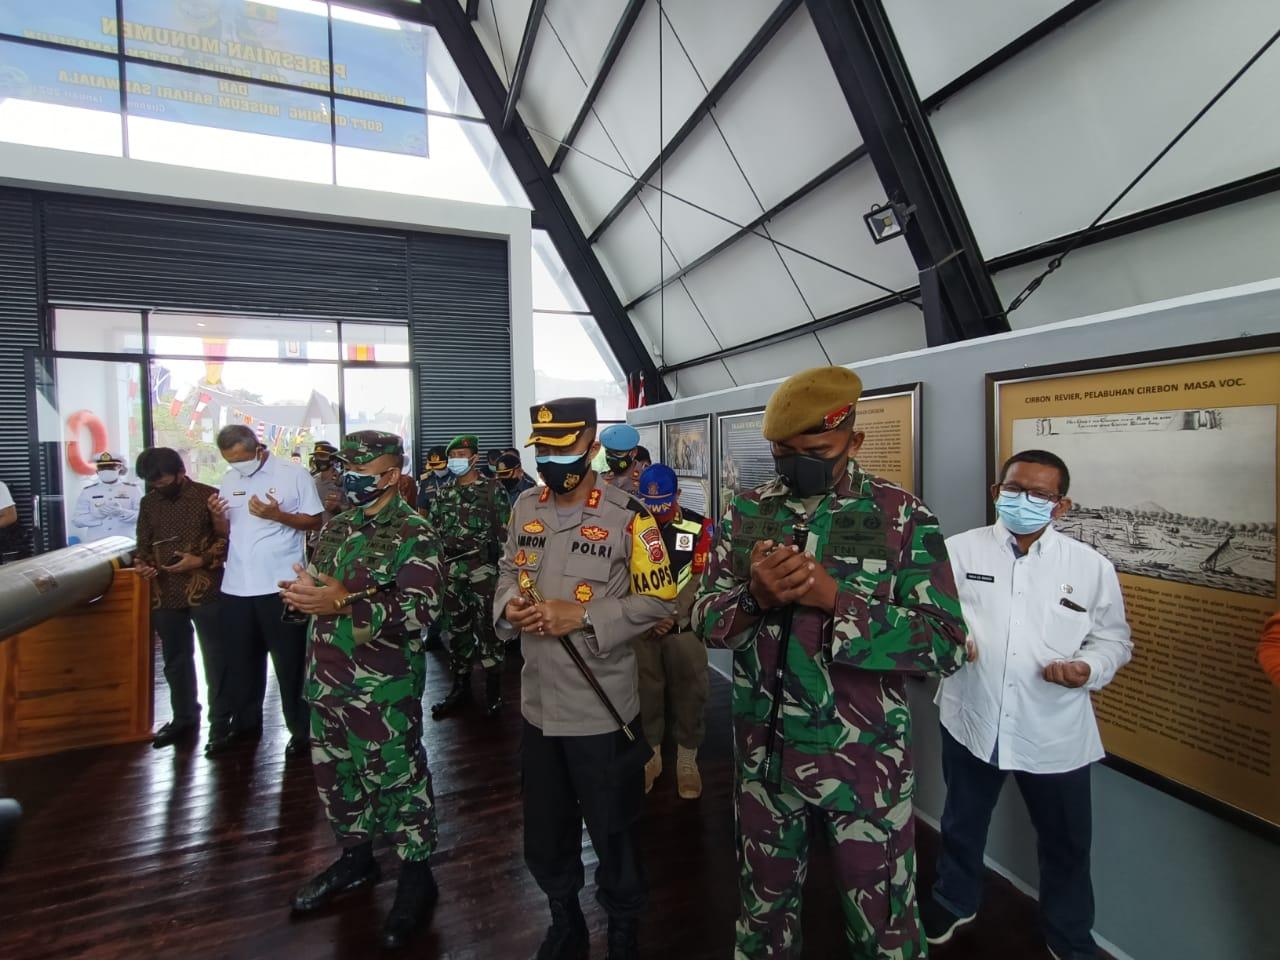 Sinergitas TNI - Polri, Kapolres Cirebon Kota Polda Jabar Menghadiri Peresmian Monumen KRI Gajahmada - 408